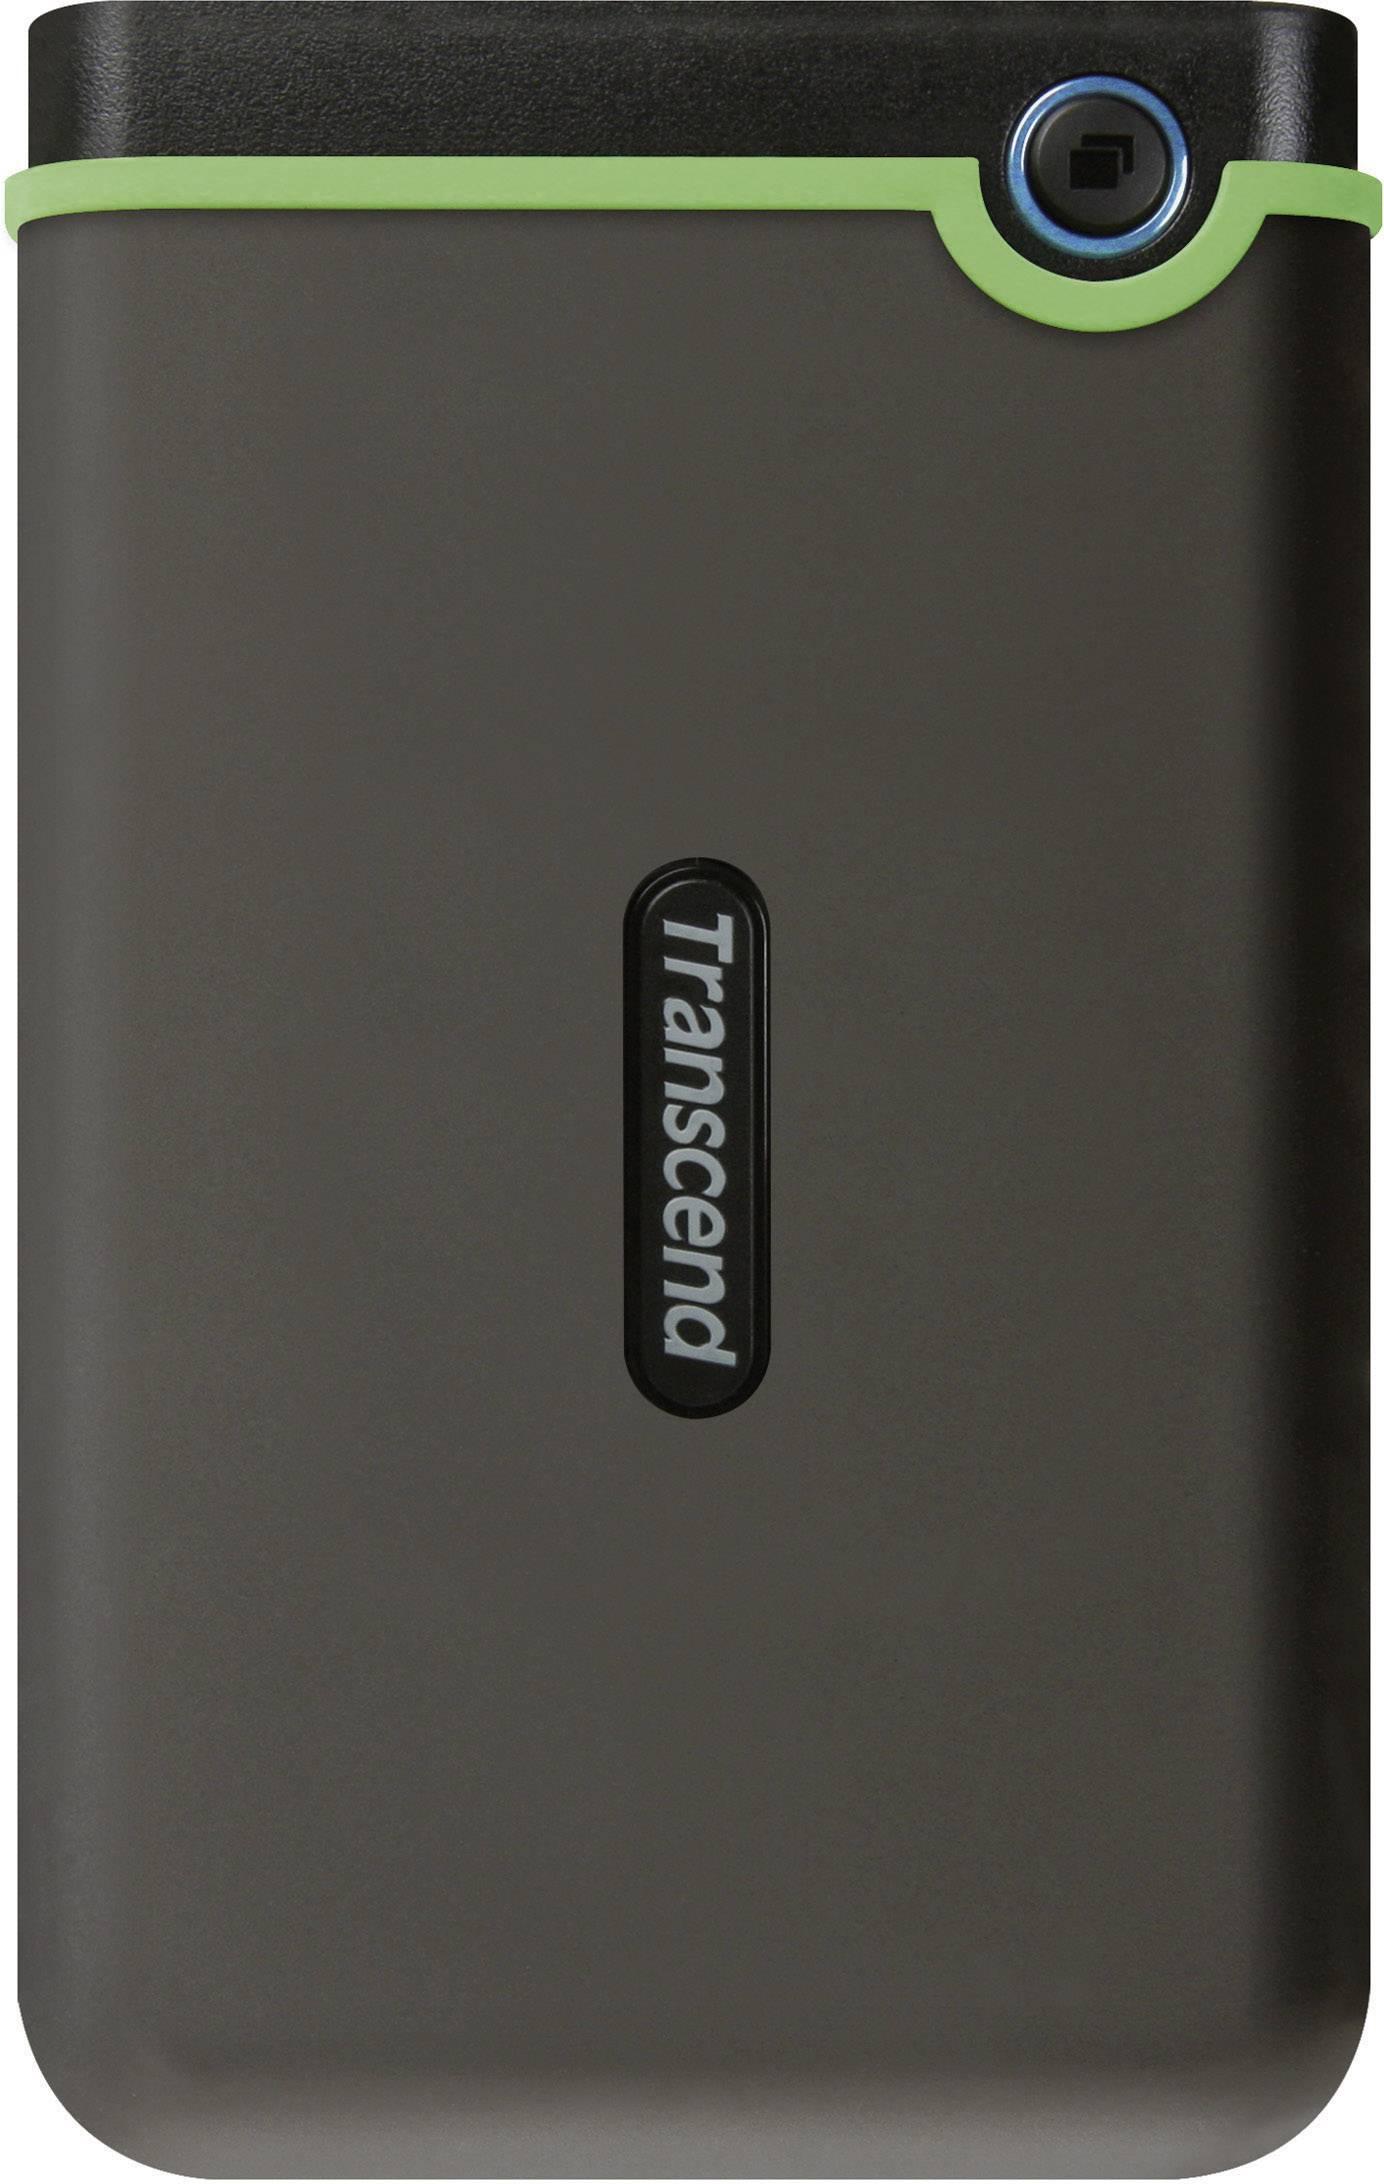 "Externý pevný disk 6,35 cm (2,5"") Transcend StoreJet 25M3, 1 TB, USB 3.0, železná sivá"